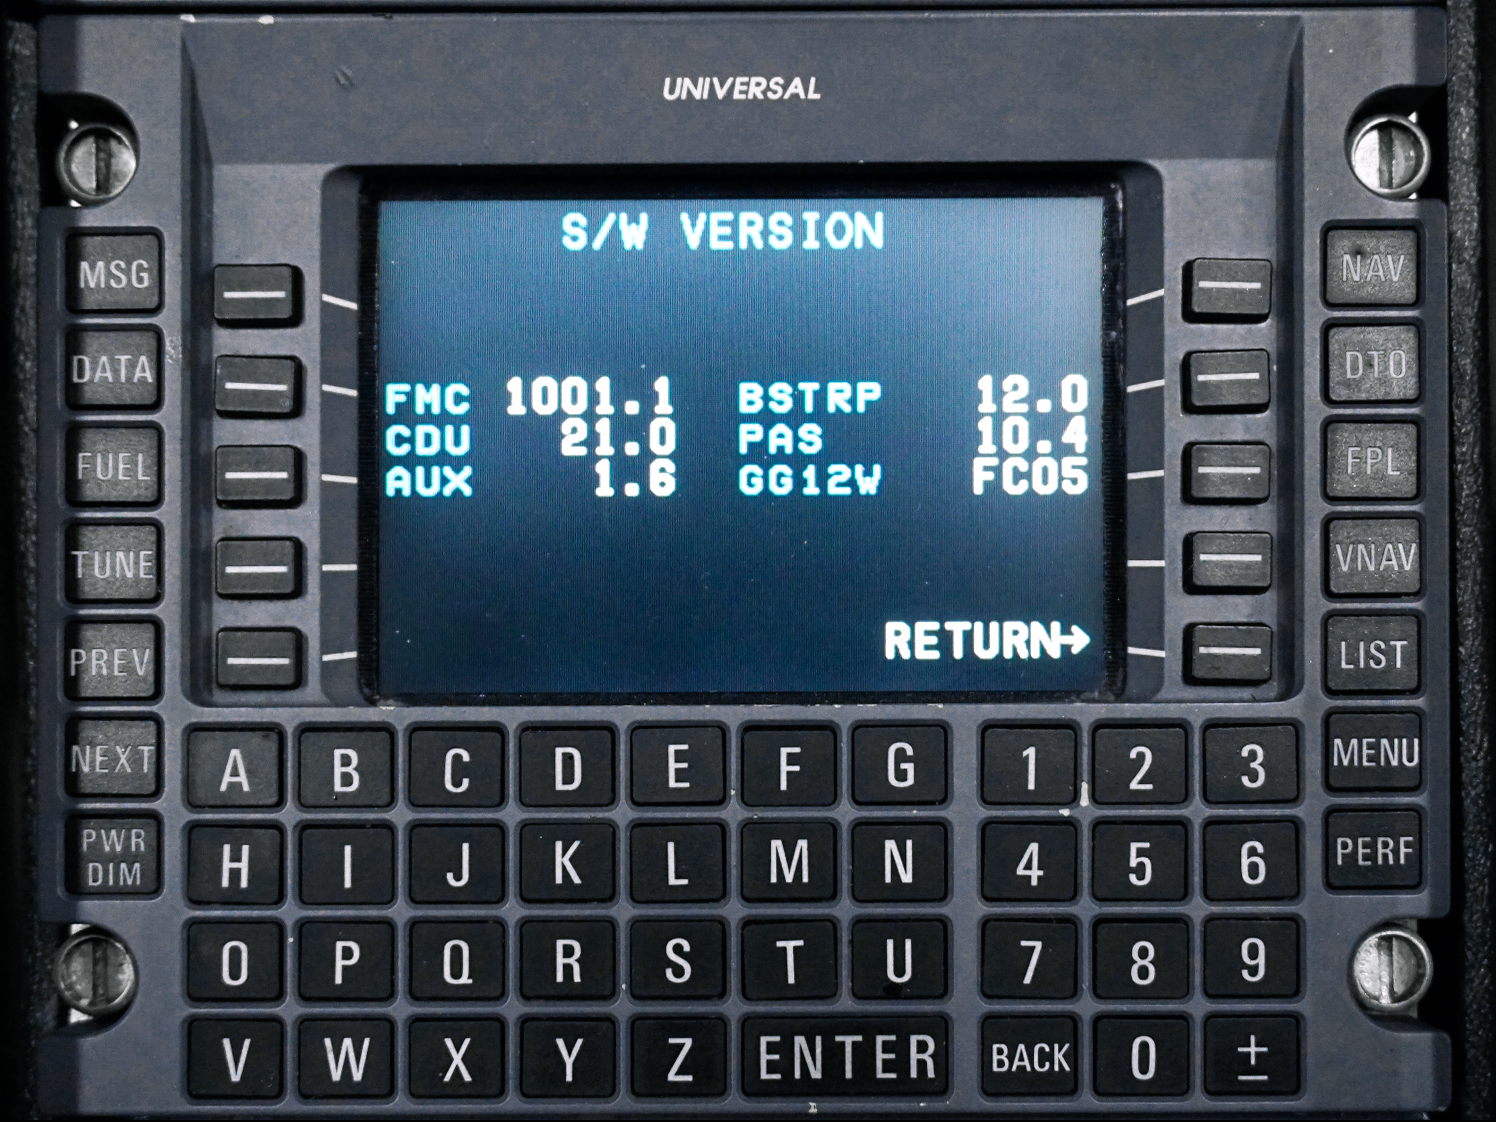 New SCN 1001.X S/W Version (Post-Mod)